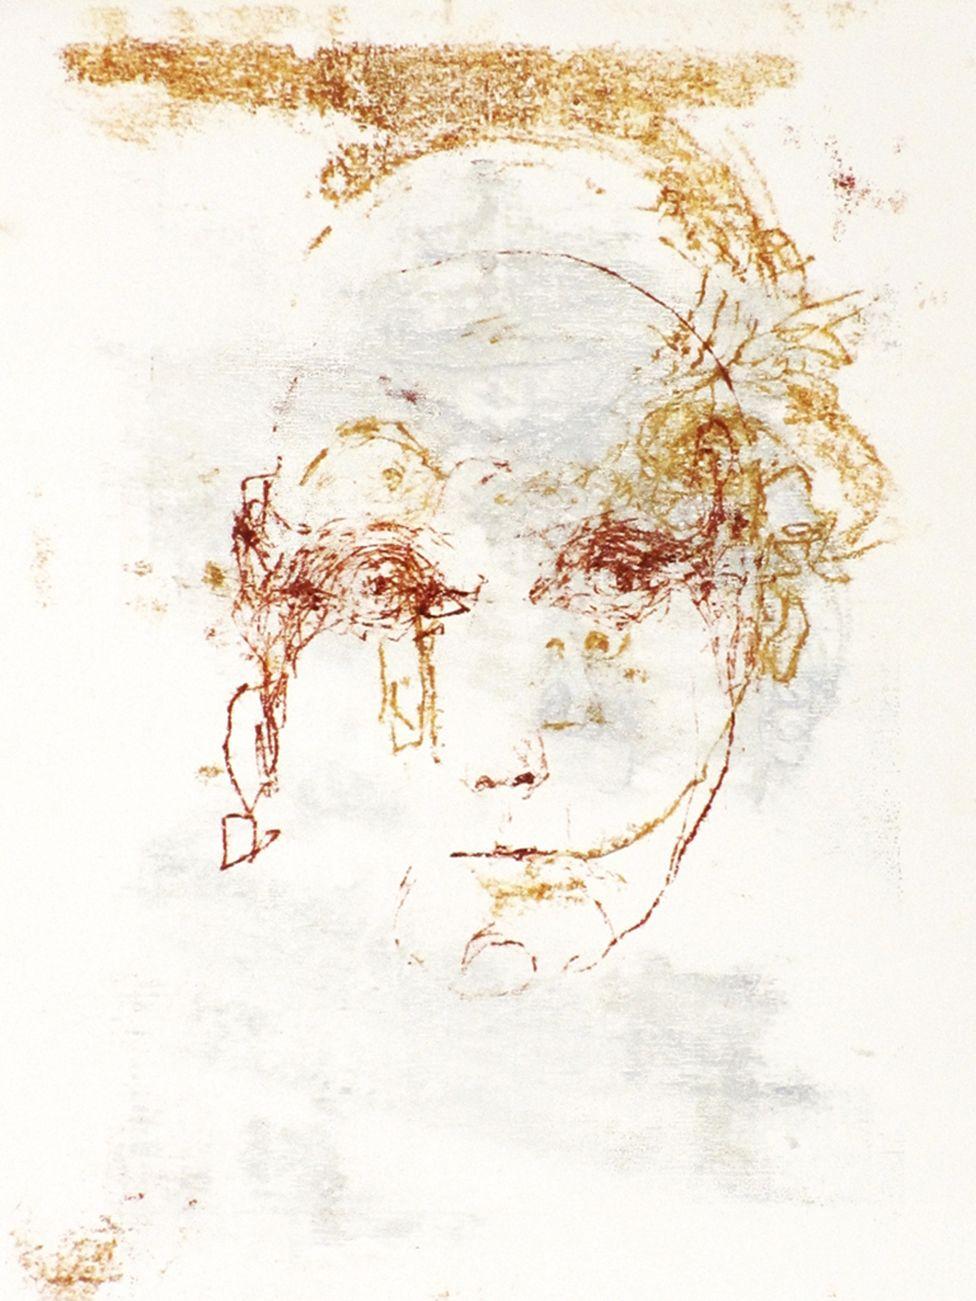 self-portrait by Carlotta